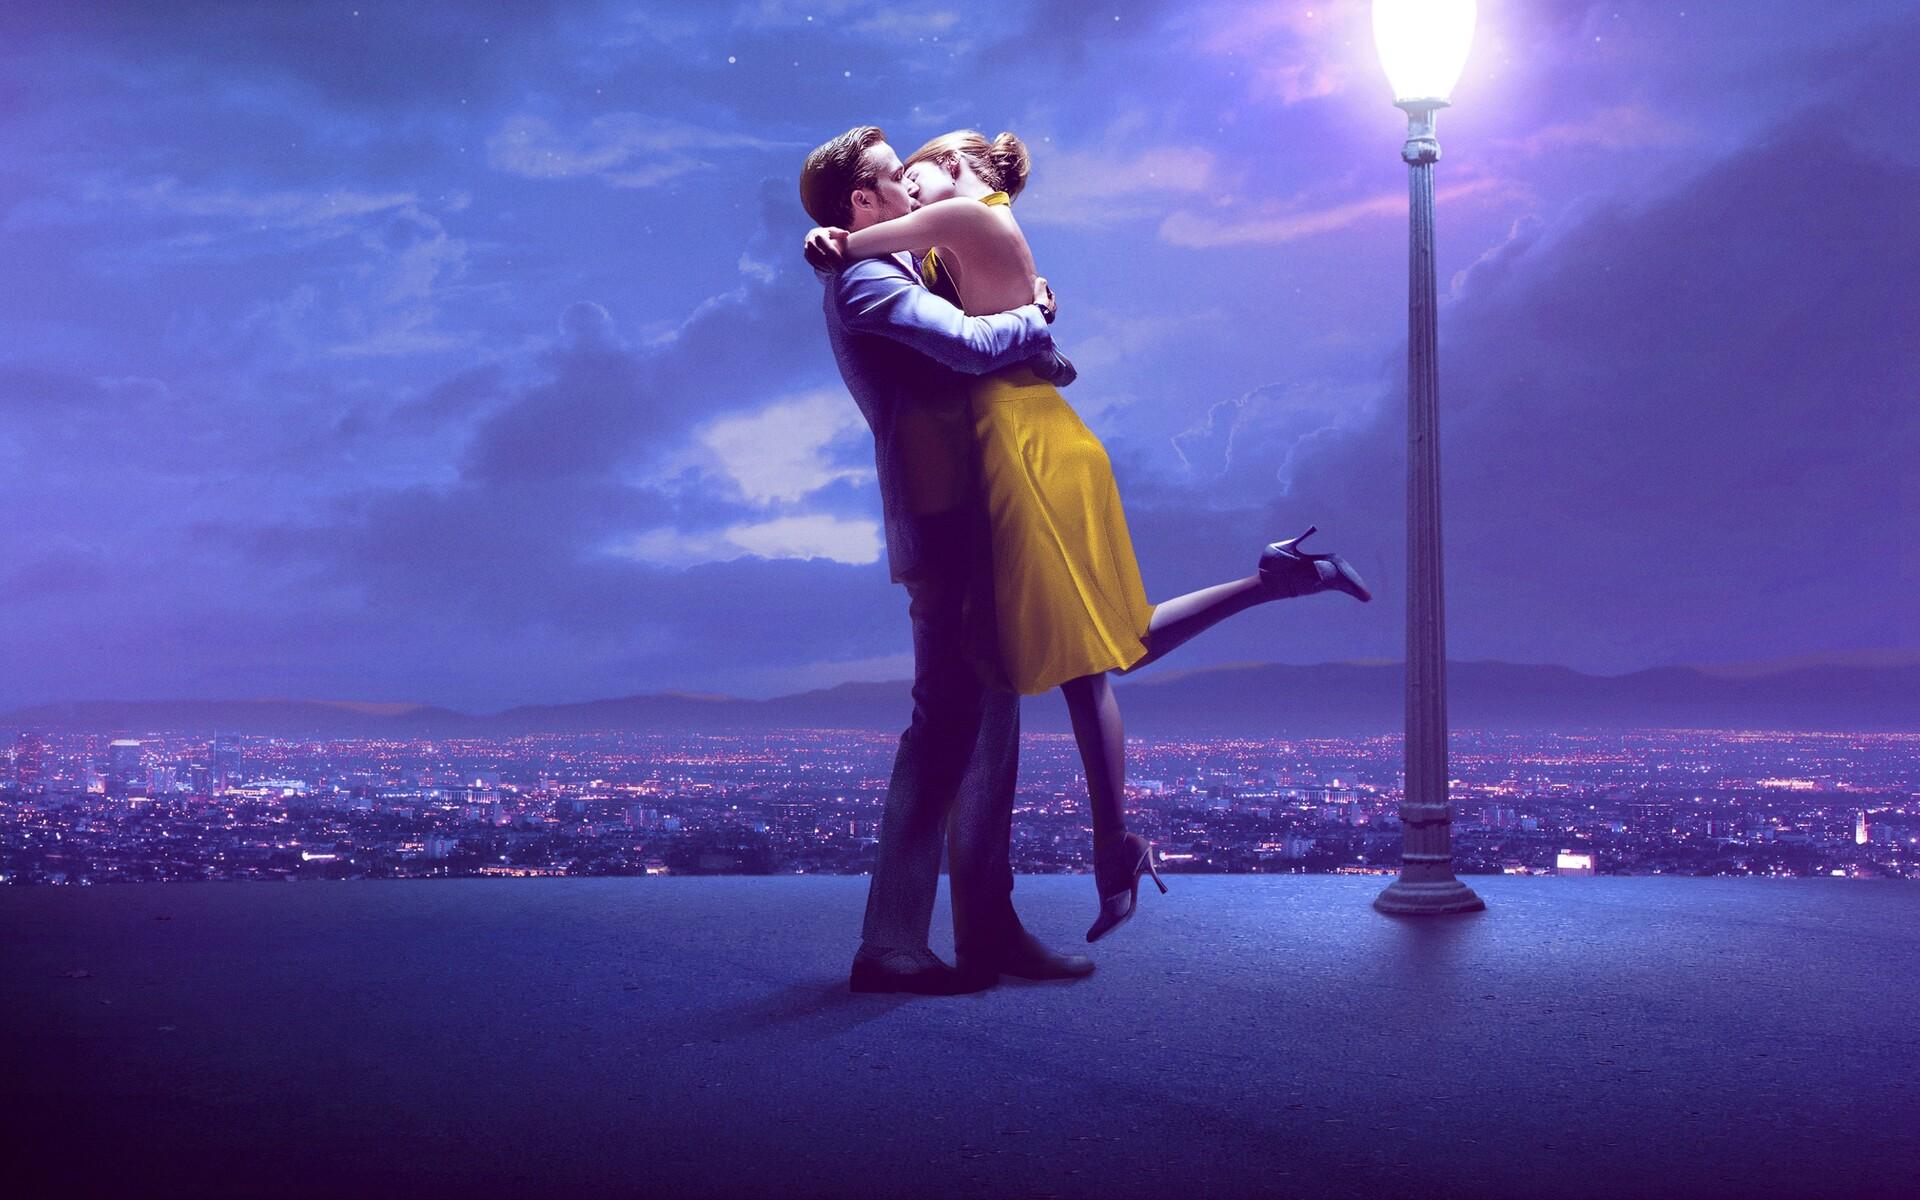 1920x1200 couple kissing 4k ryan gosling emma stone 1080p - 4k kiss wallpaper ...